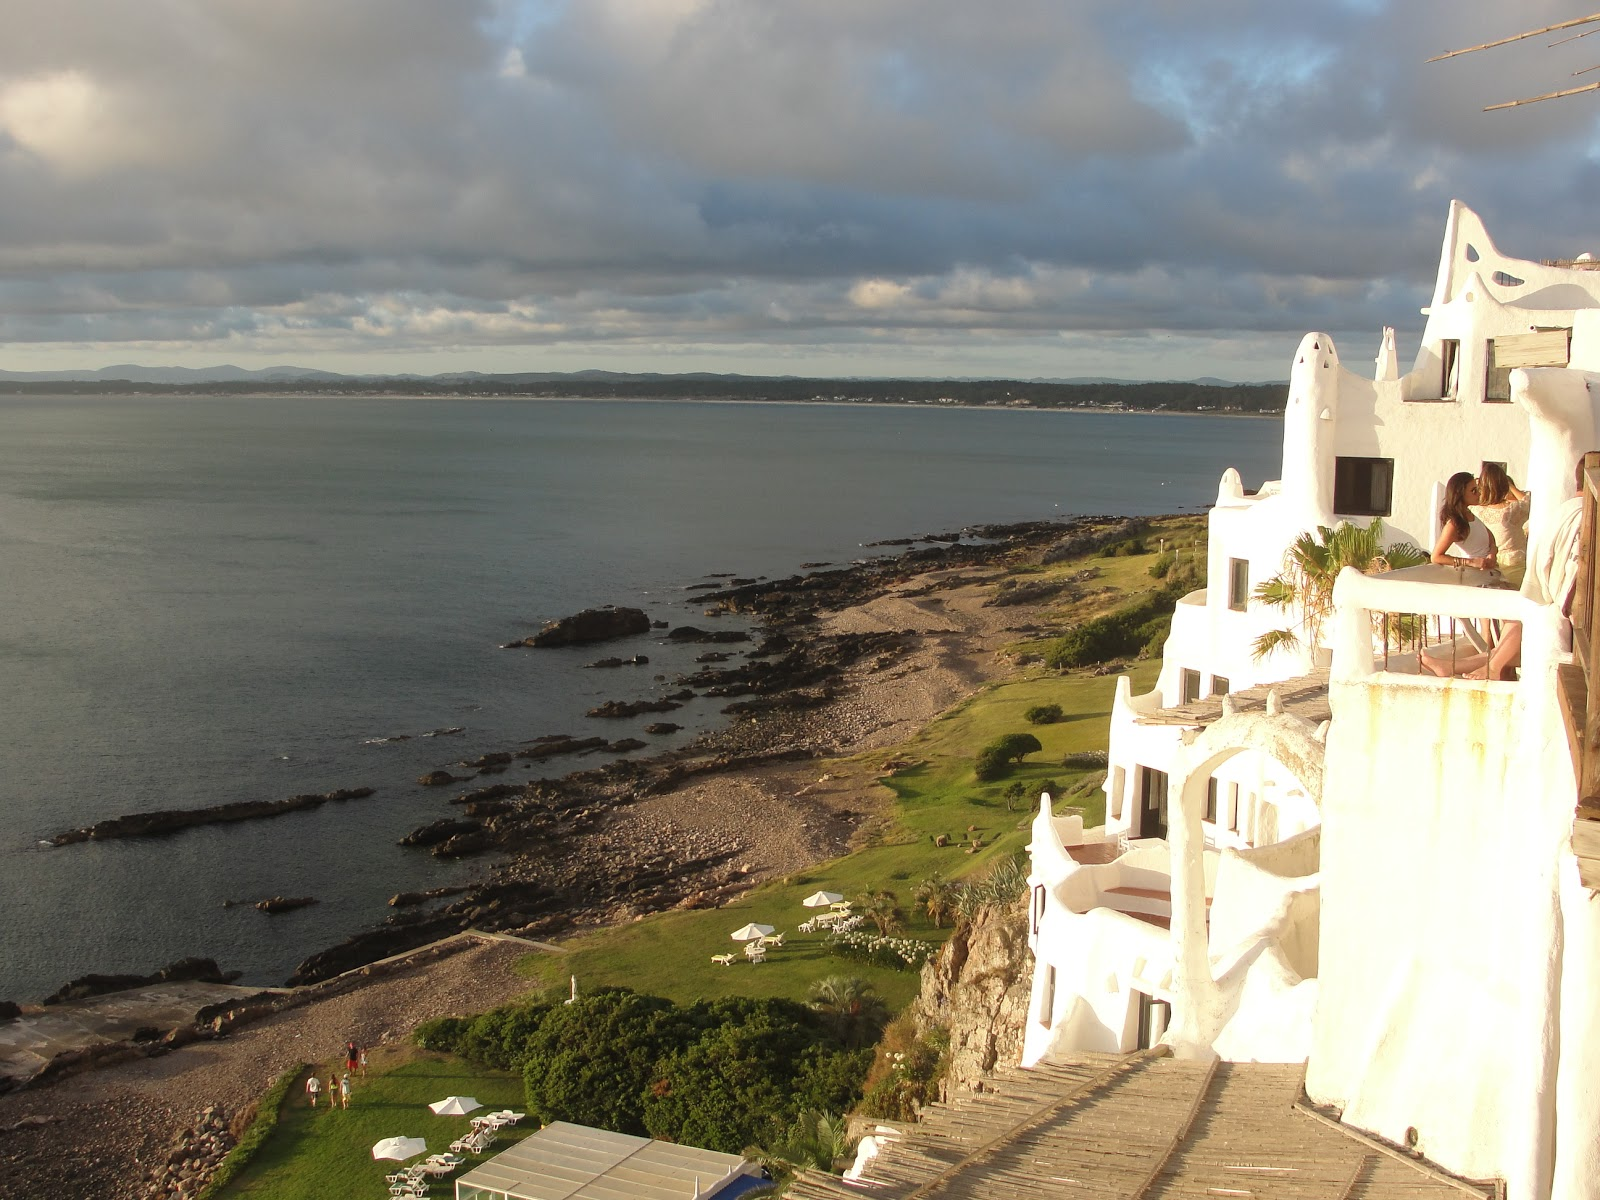 Uruguai: Passeios, Roteiros, Dicas